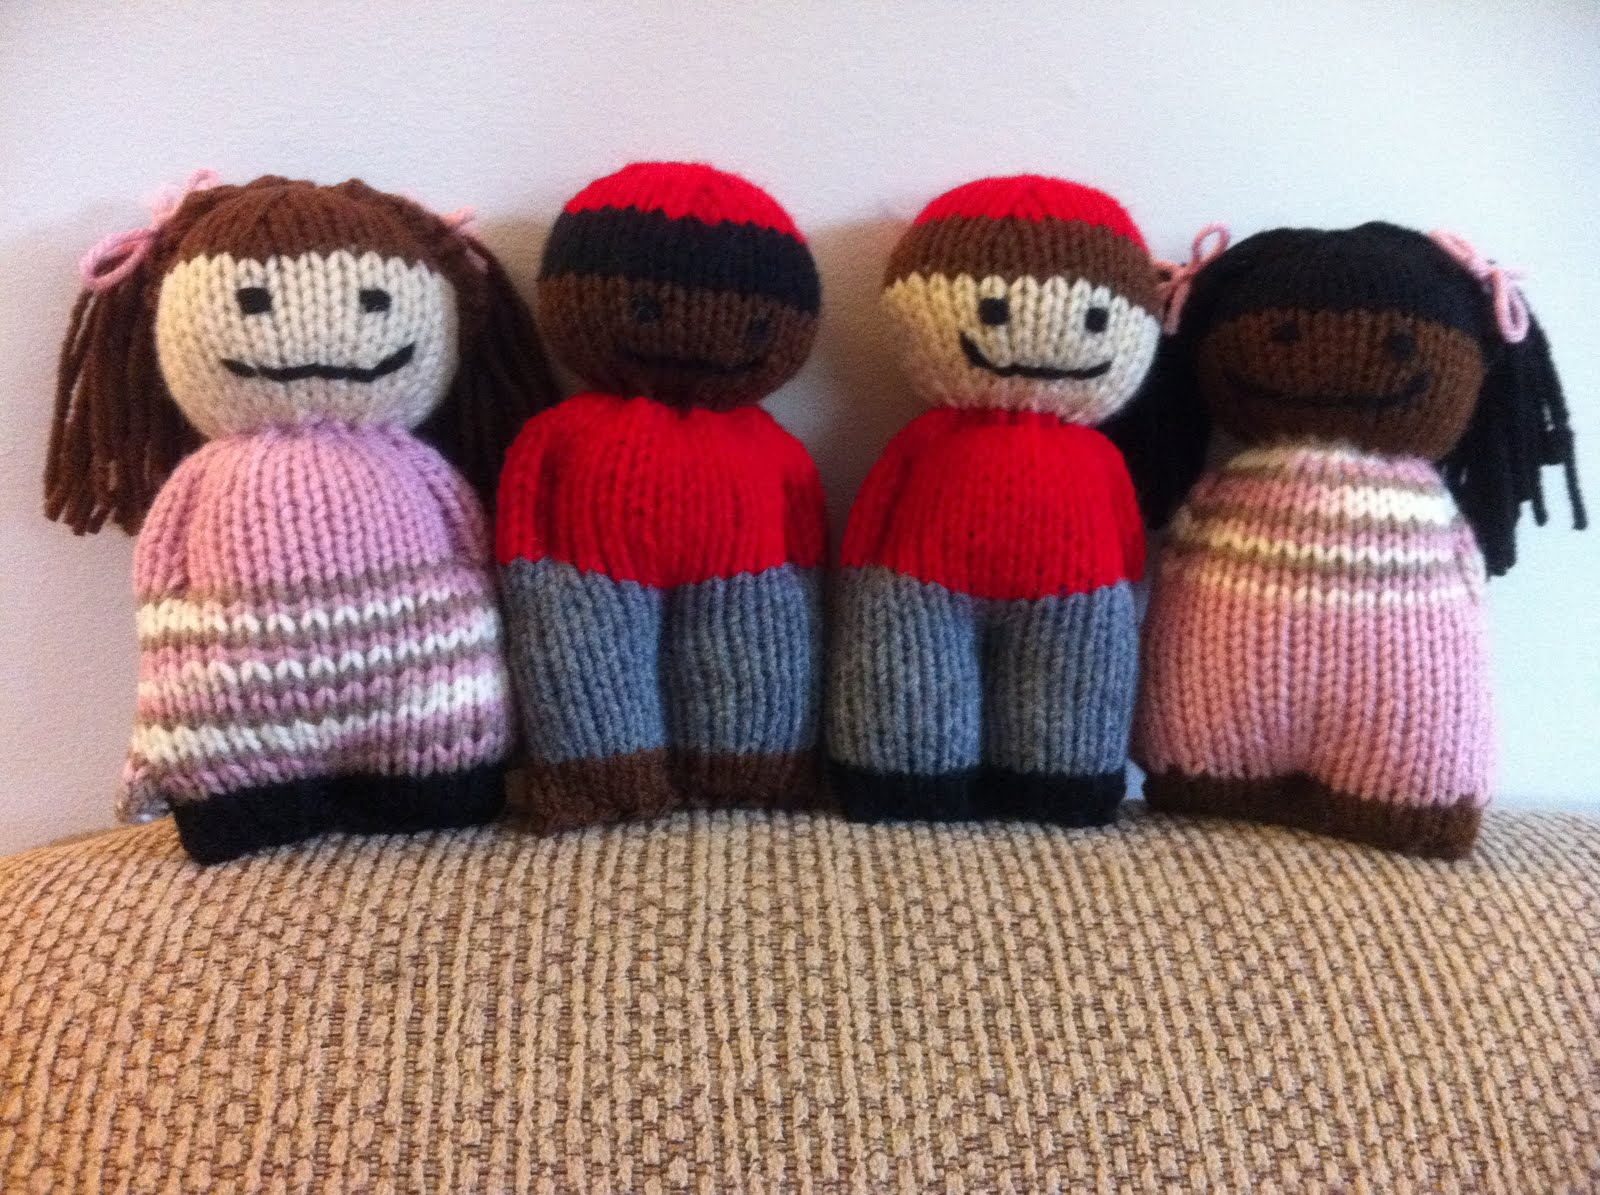 Jenns Yarn Addiction: Comfort Dolls